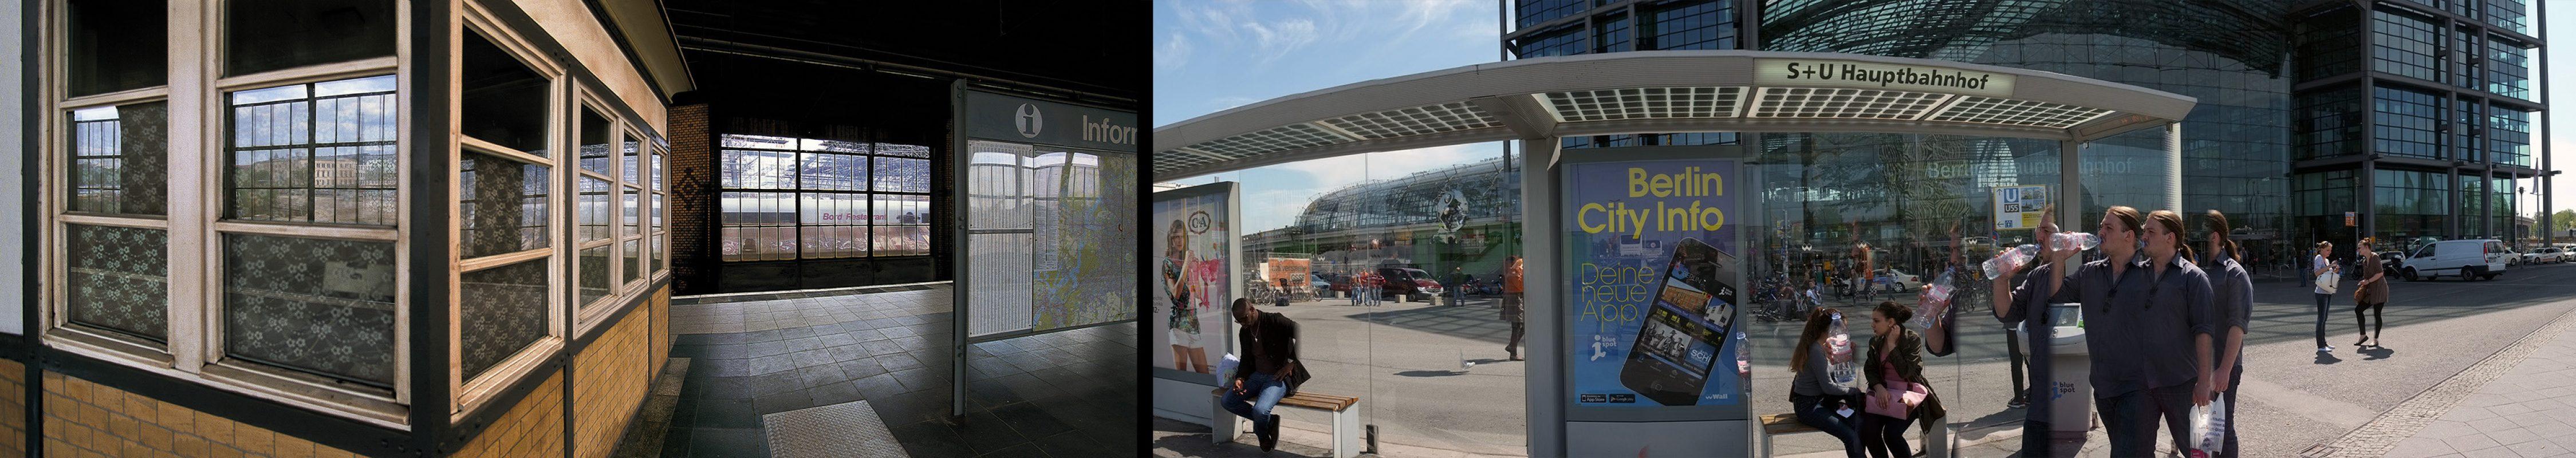 Berlin, Infohaus Lehrer Bahnhof, Hauptbahnhof